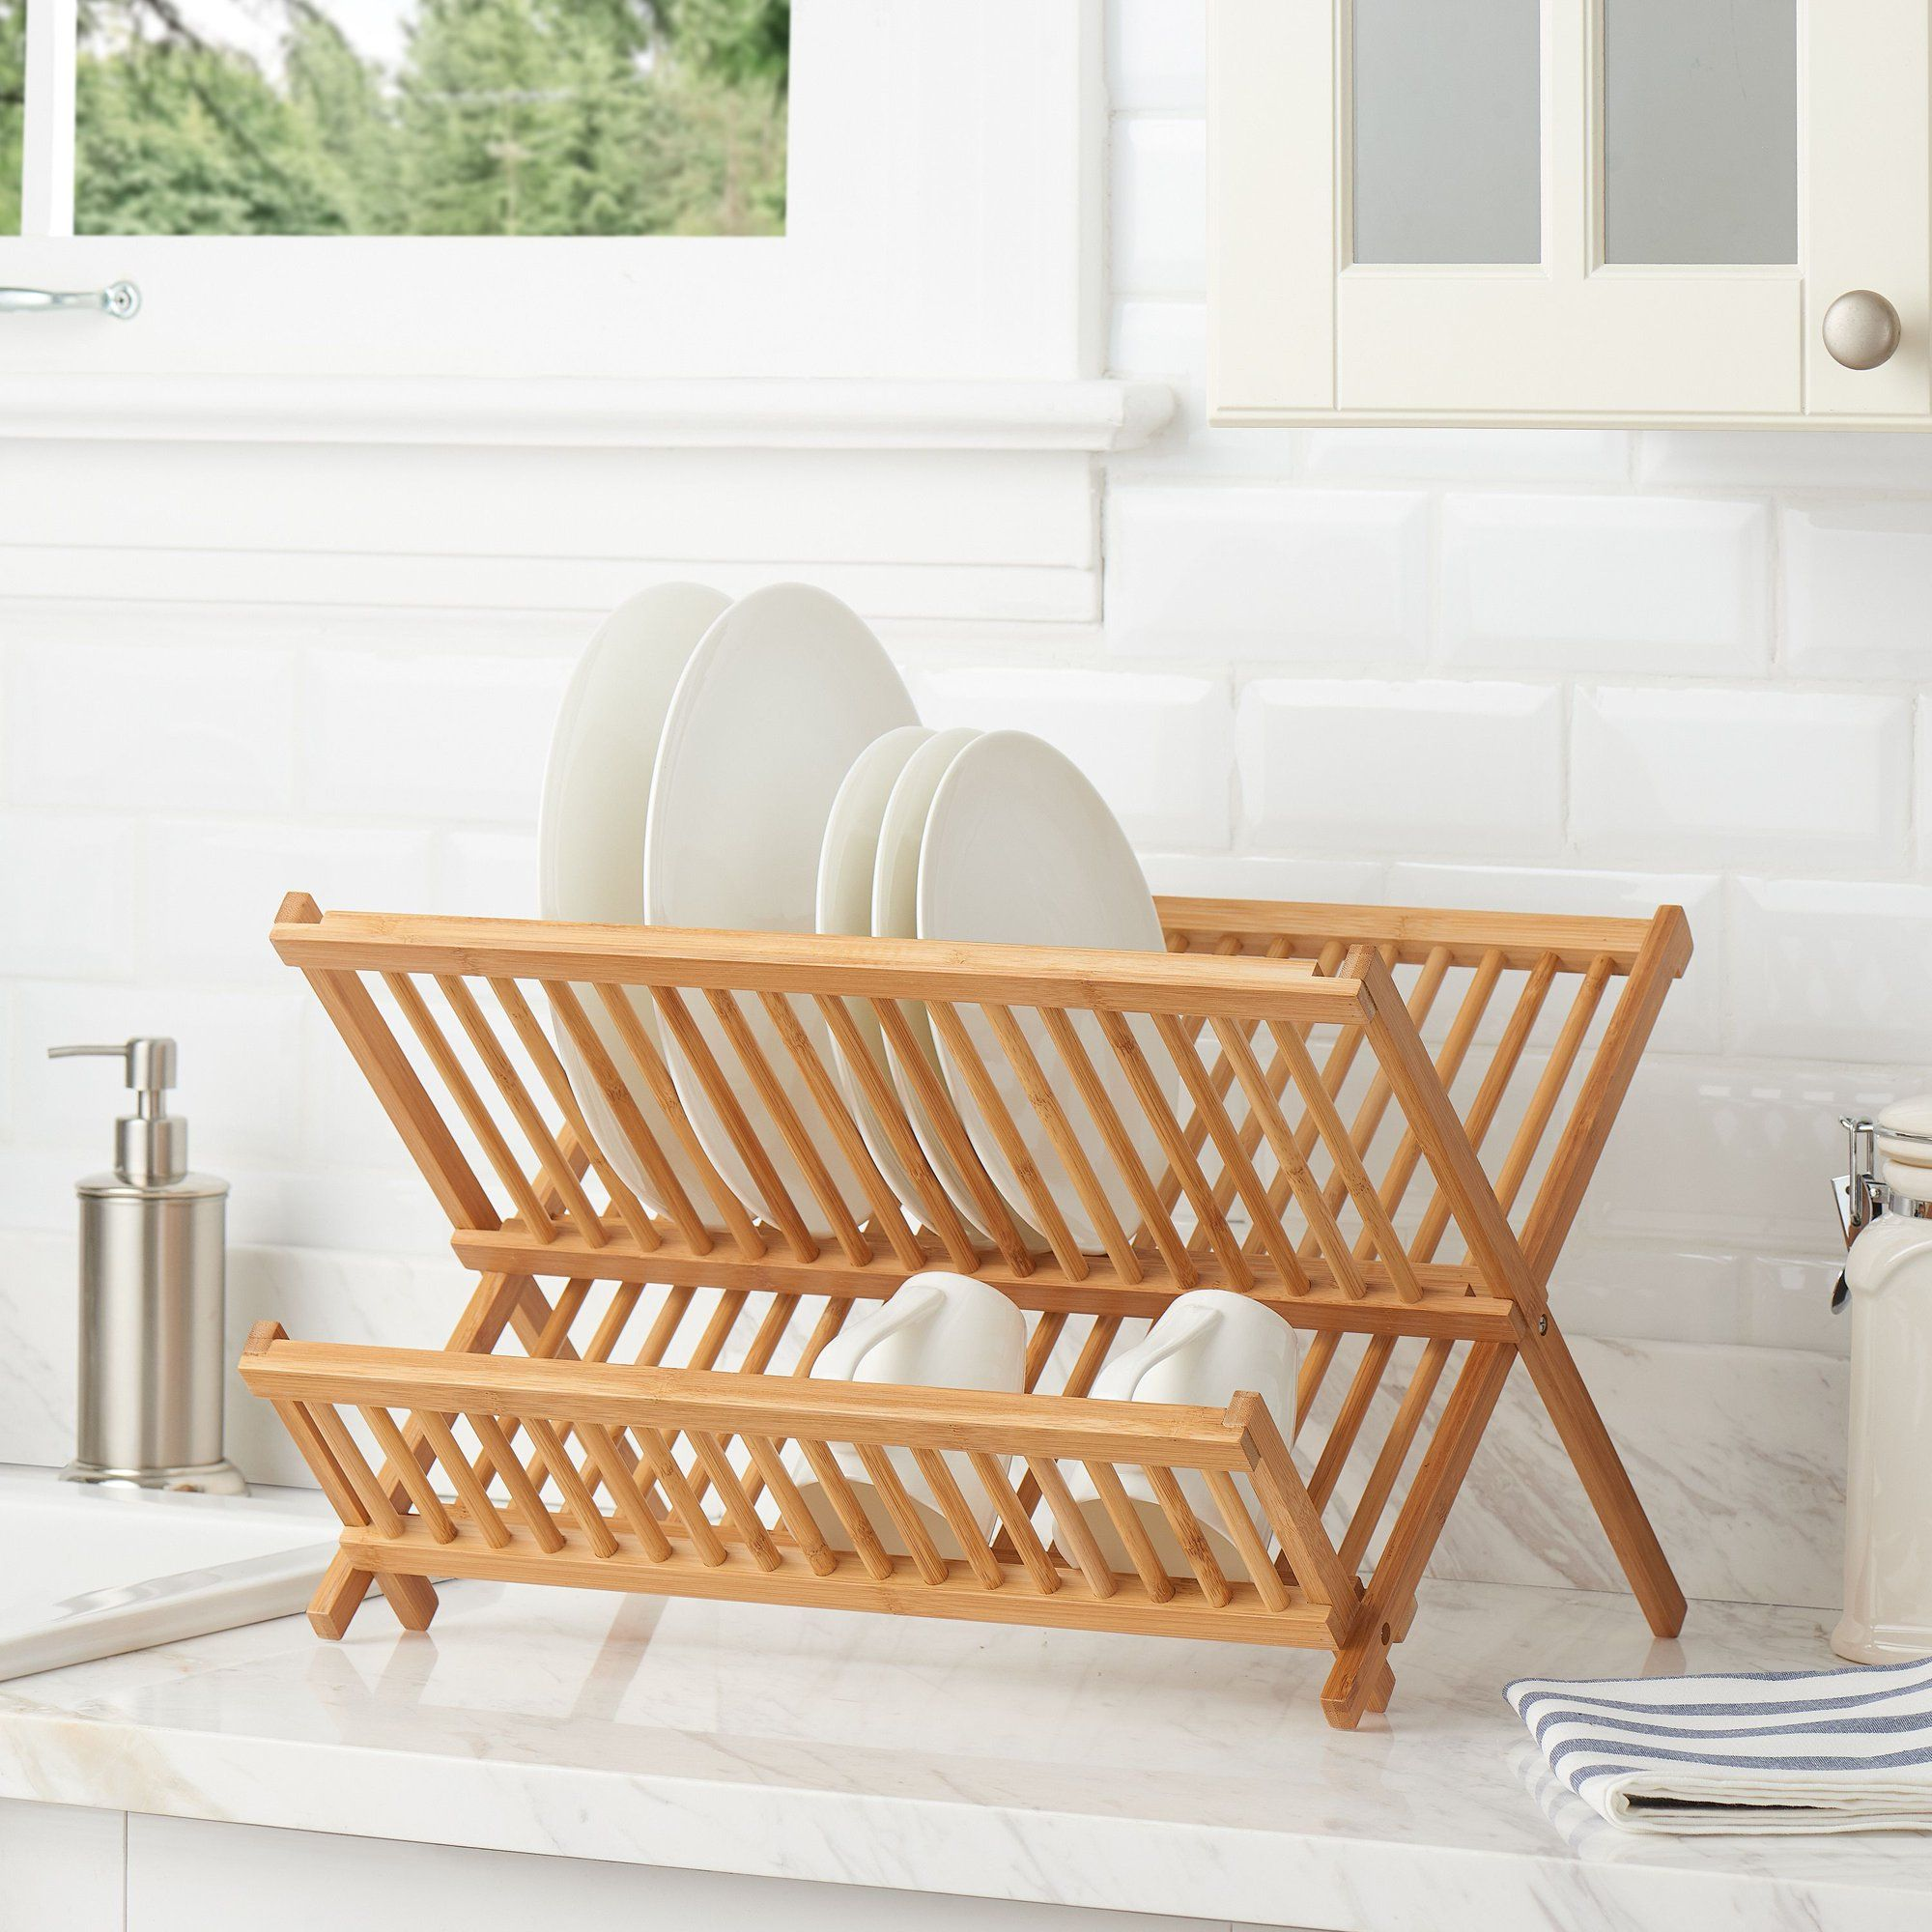 97adbd60062aa4c1cec05df42bb6fe66 - Better Homes And Gardens Metal Folding Drying Rack